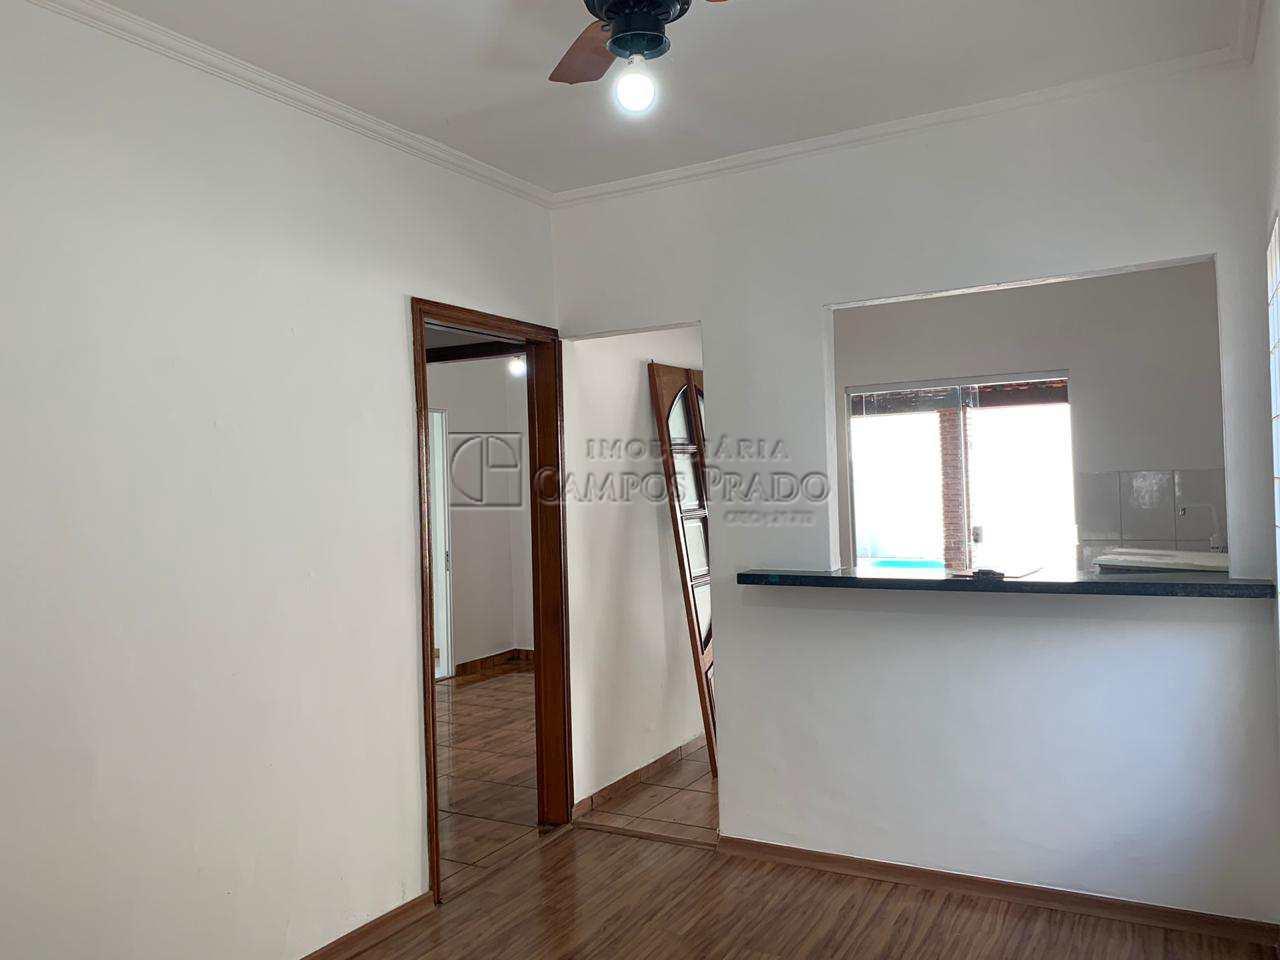 Casa com 2 dorms, Jardim Olímpia, Jaú, Cod: 47239